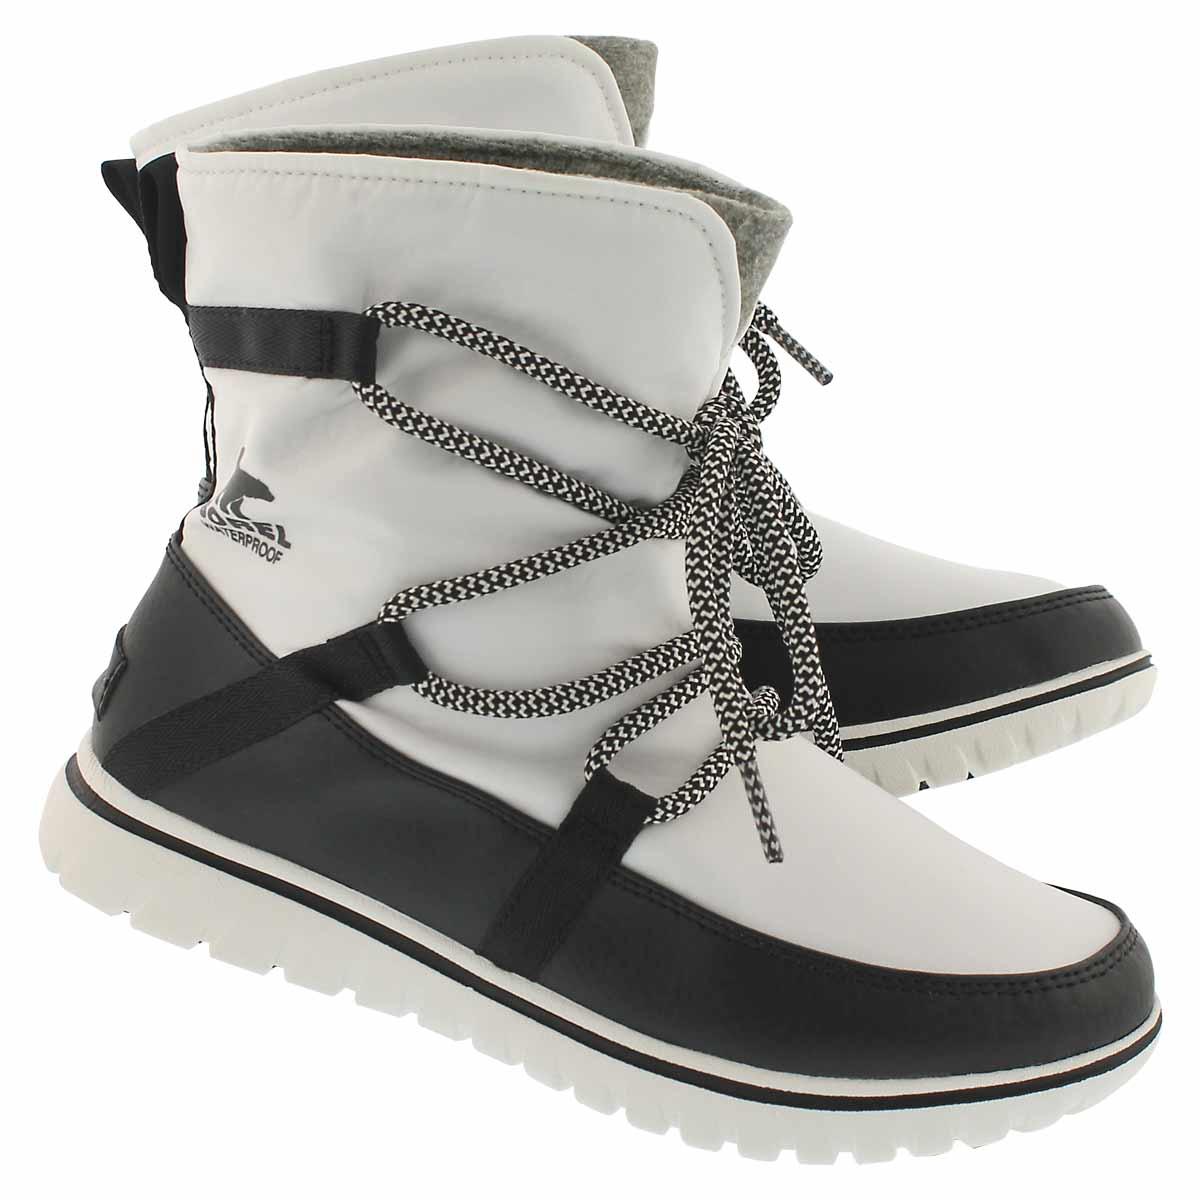 Lds Cozy Explorer sea salt wtpf boot